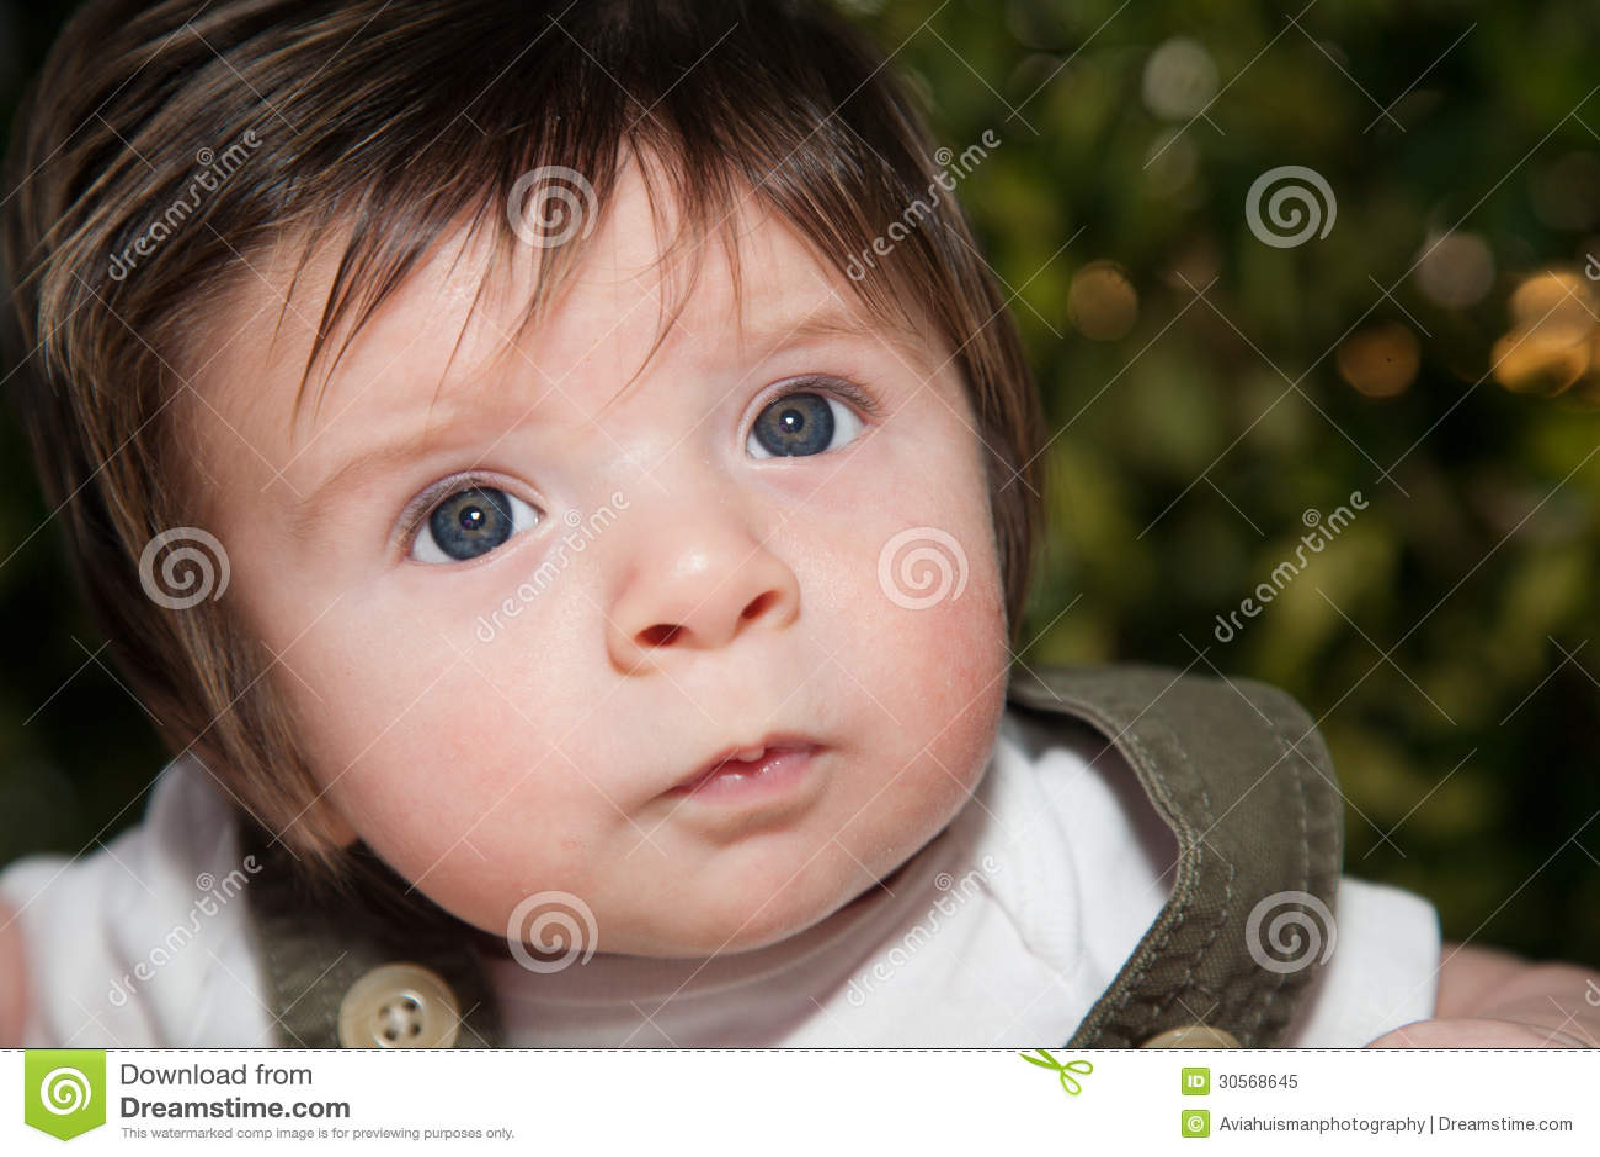 Baby Boy Royalty Free Stock Photo - Image: 30568645